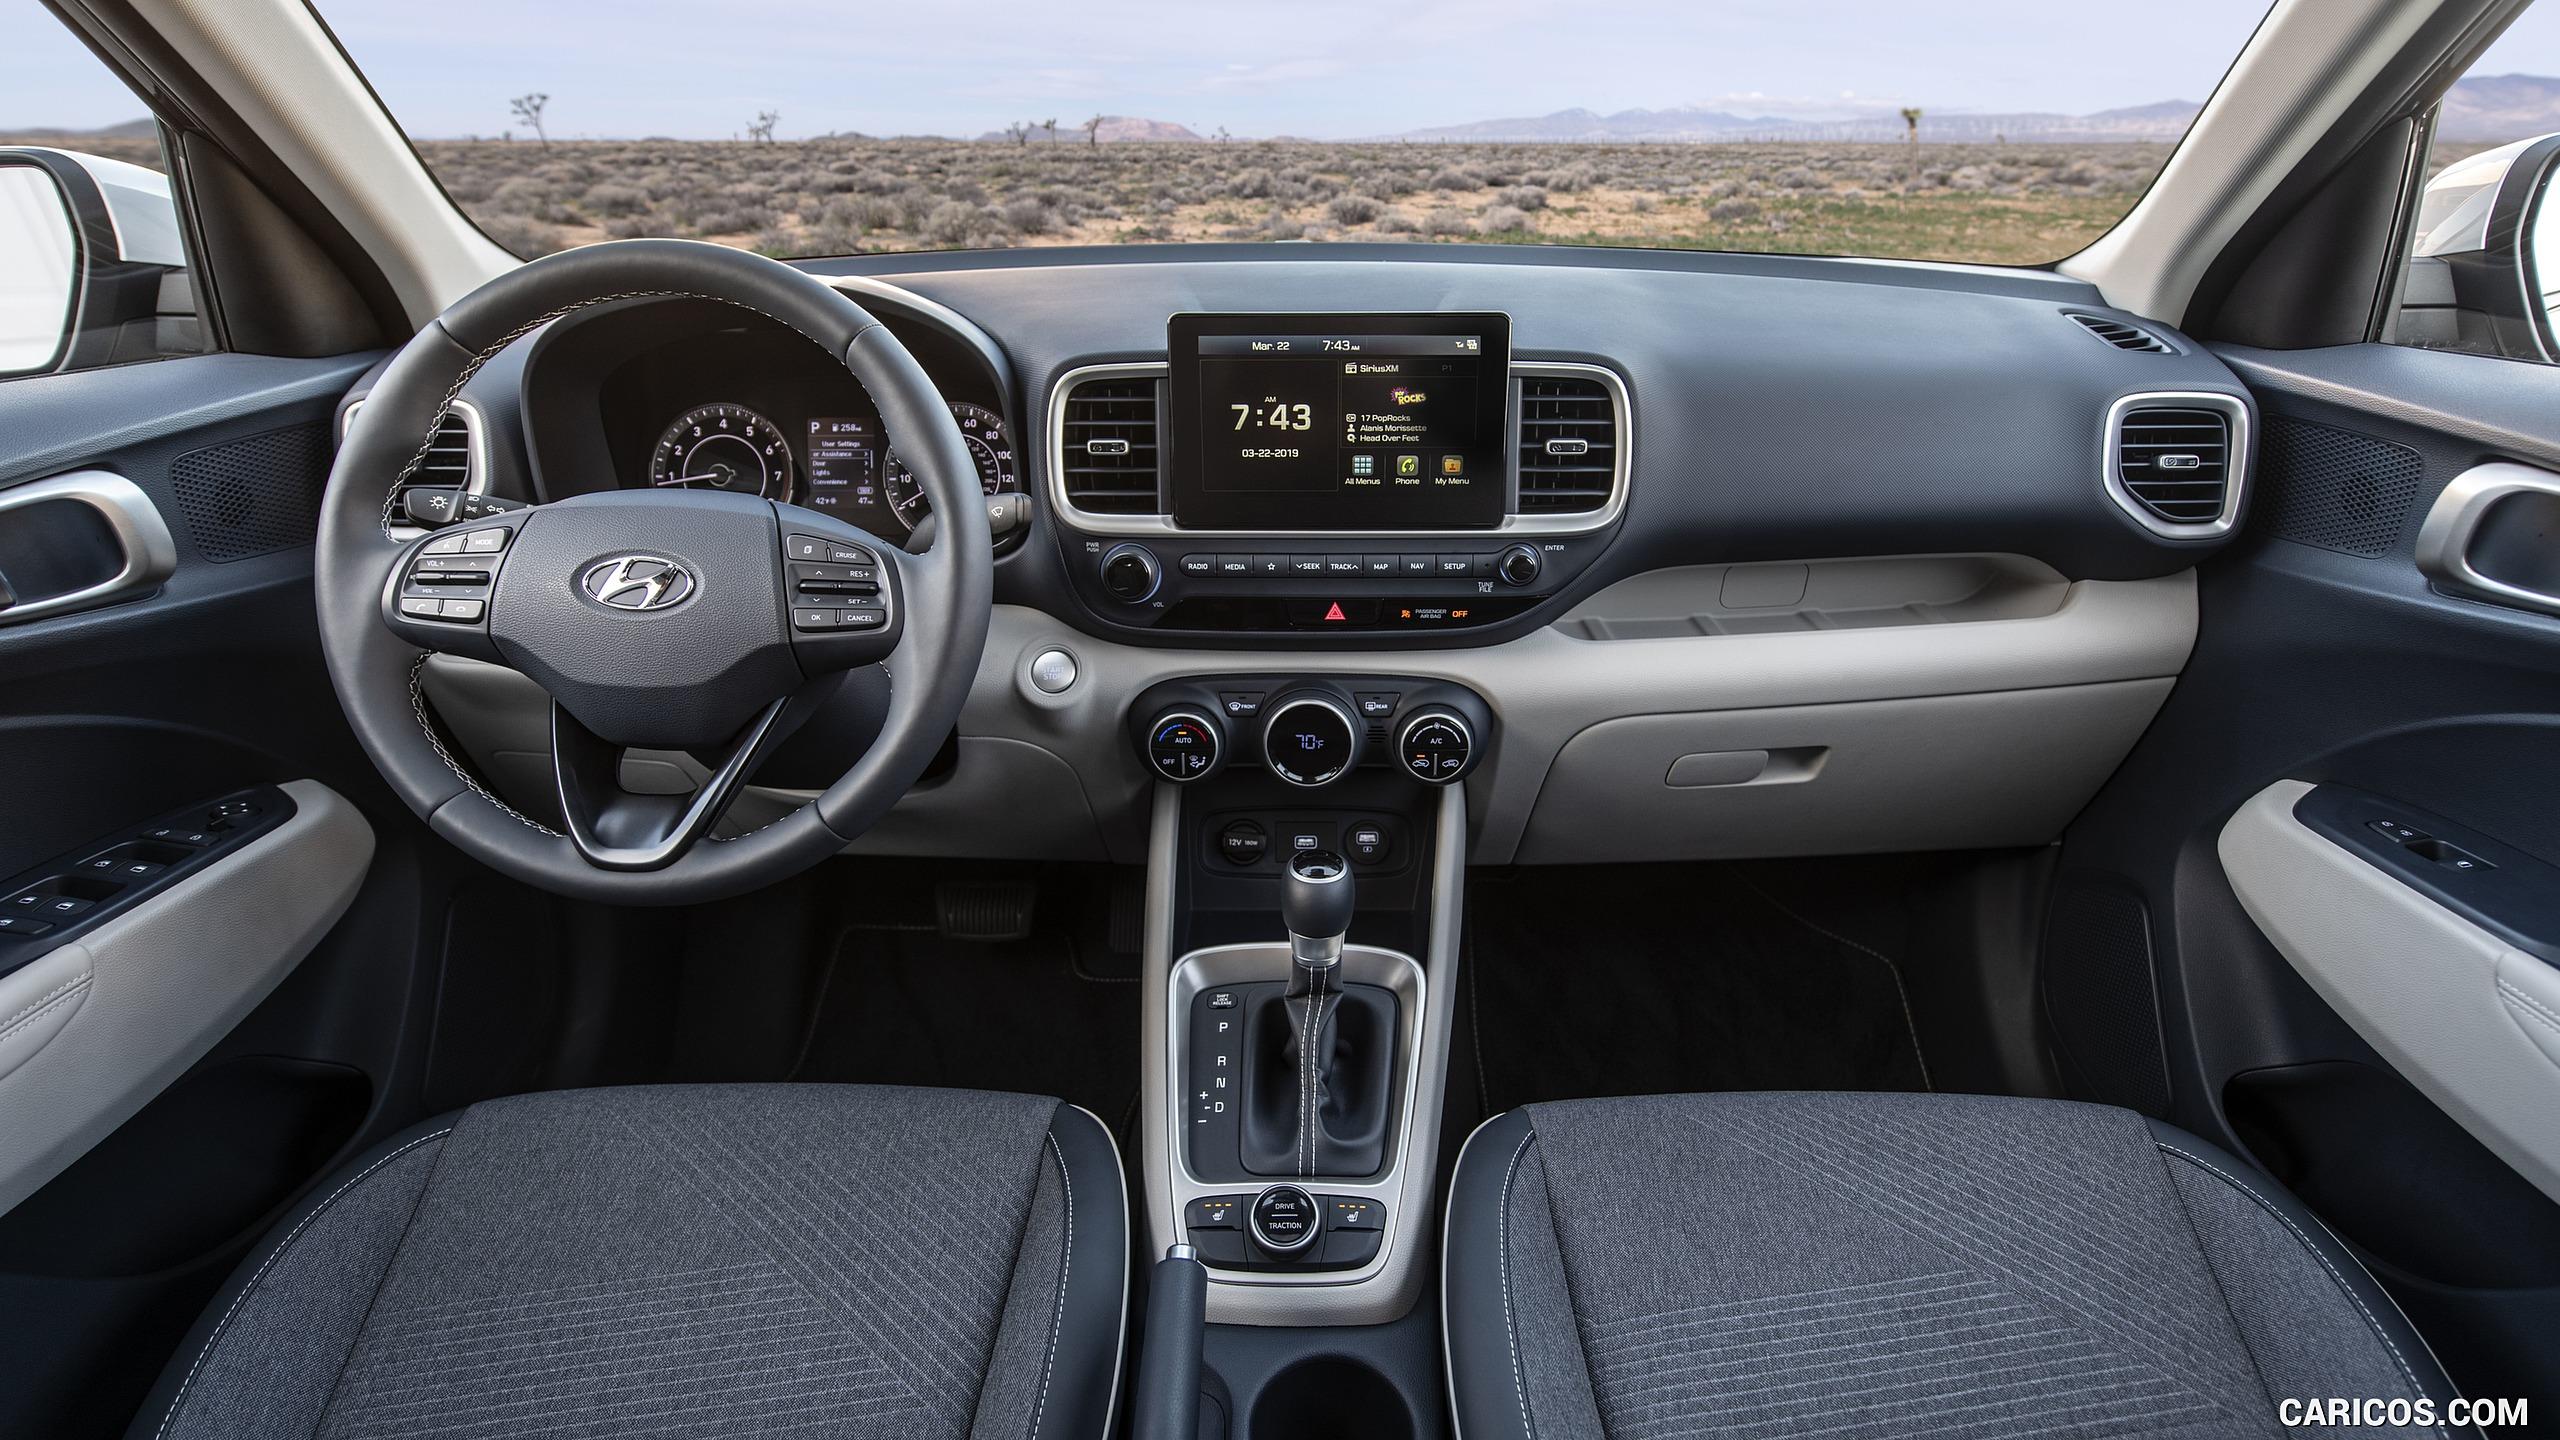 2020 Hyundai Venue   Interior Cockpit HD Wallpaper 19 2560x1440